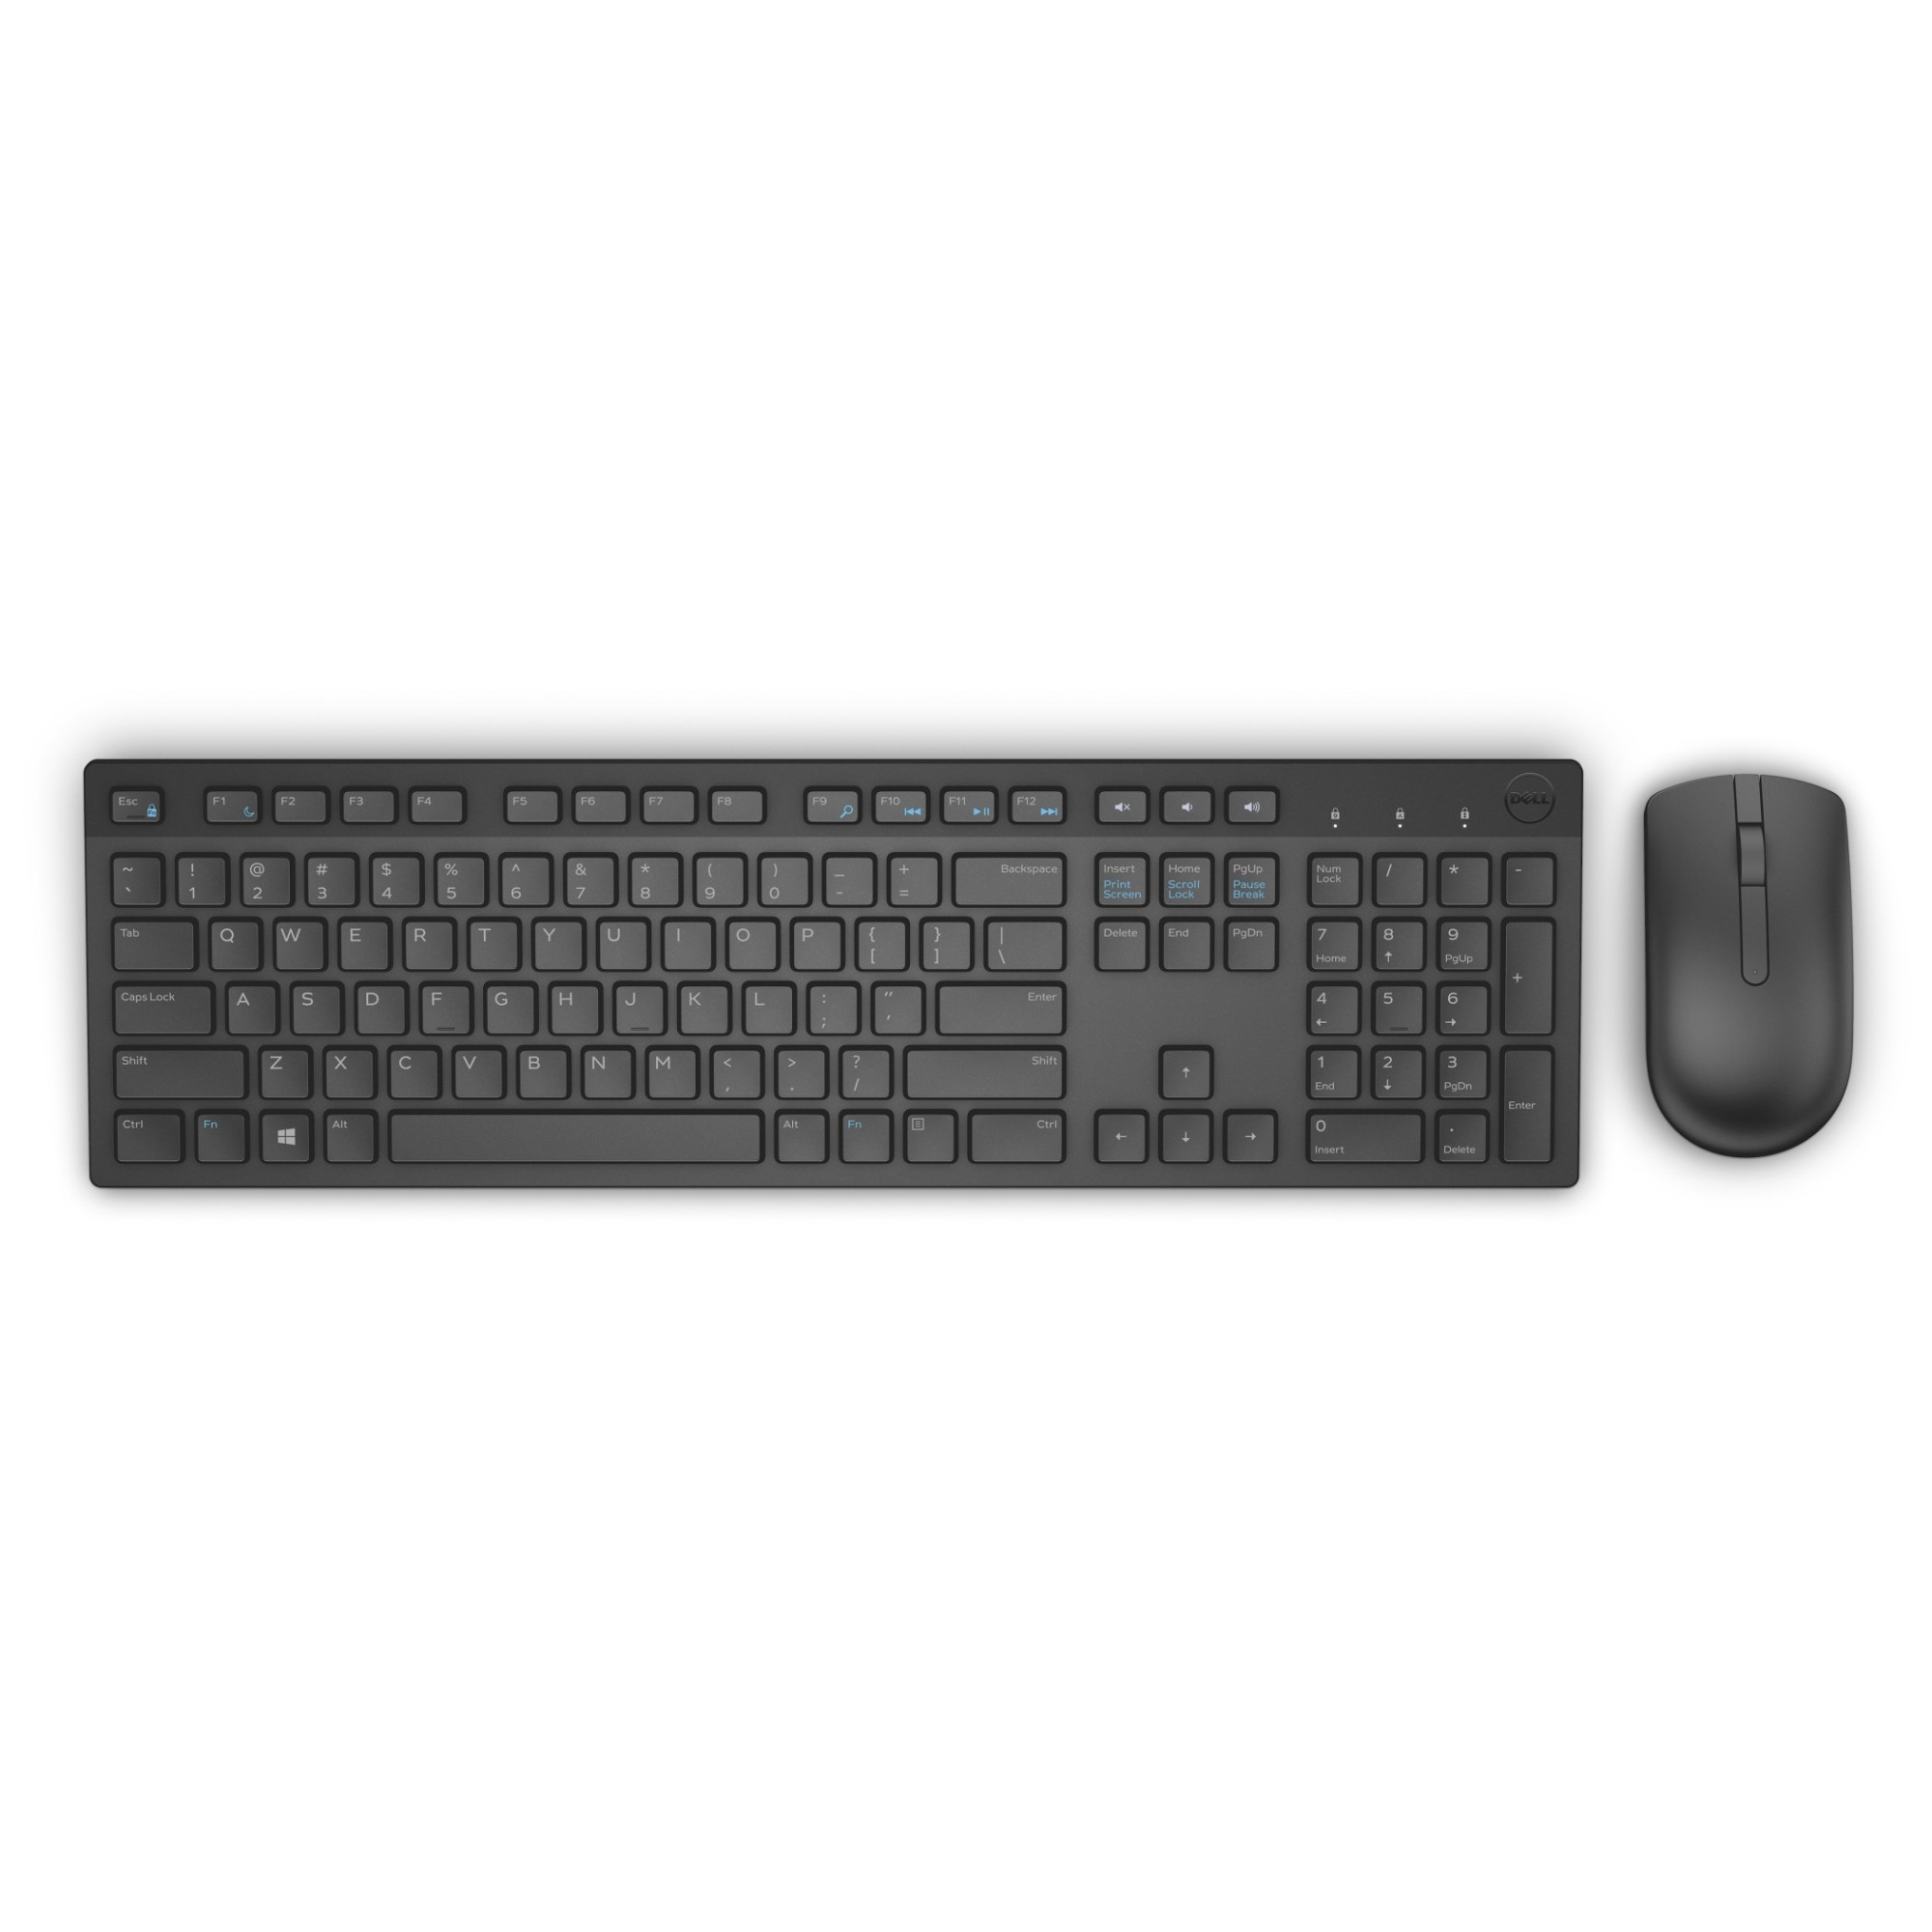 DELL KM636 teclado RF inalámbrico QWERTY Español Negro